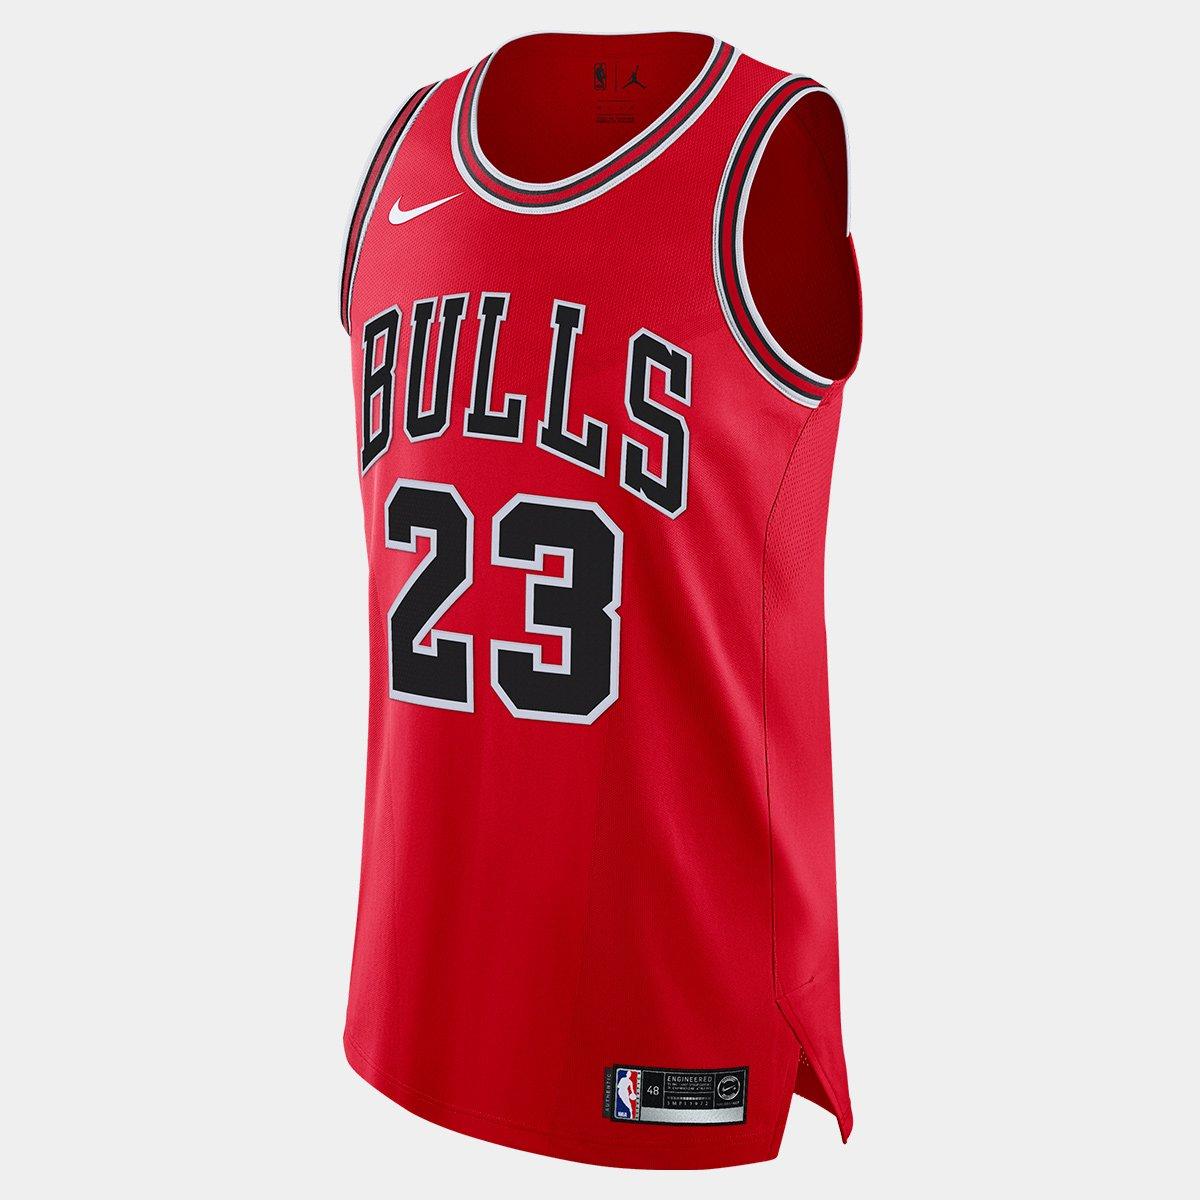 ce37d1483 Regata Authentic Nike Chicago Bulls Road Jordan 23 - Compre Agora ...